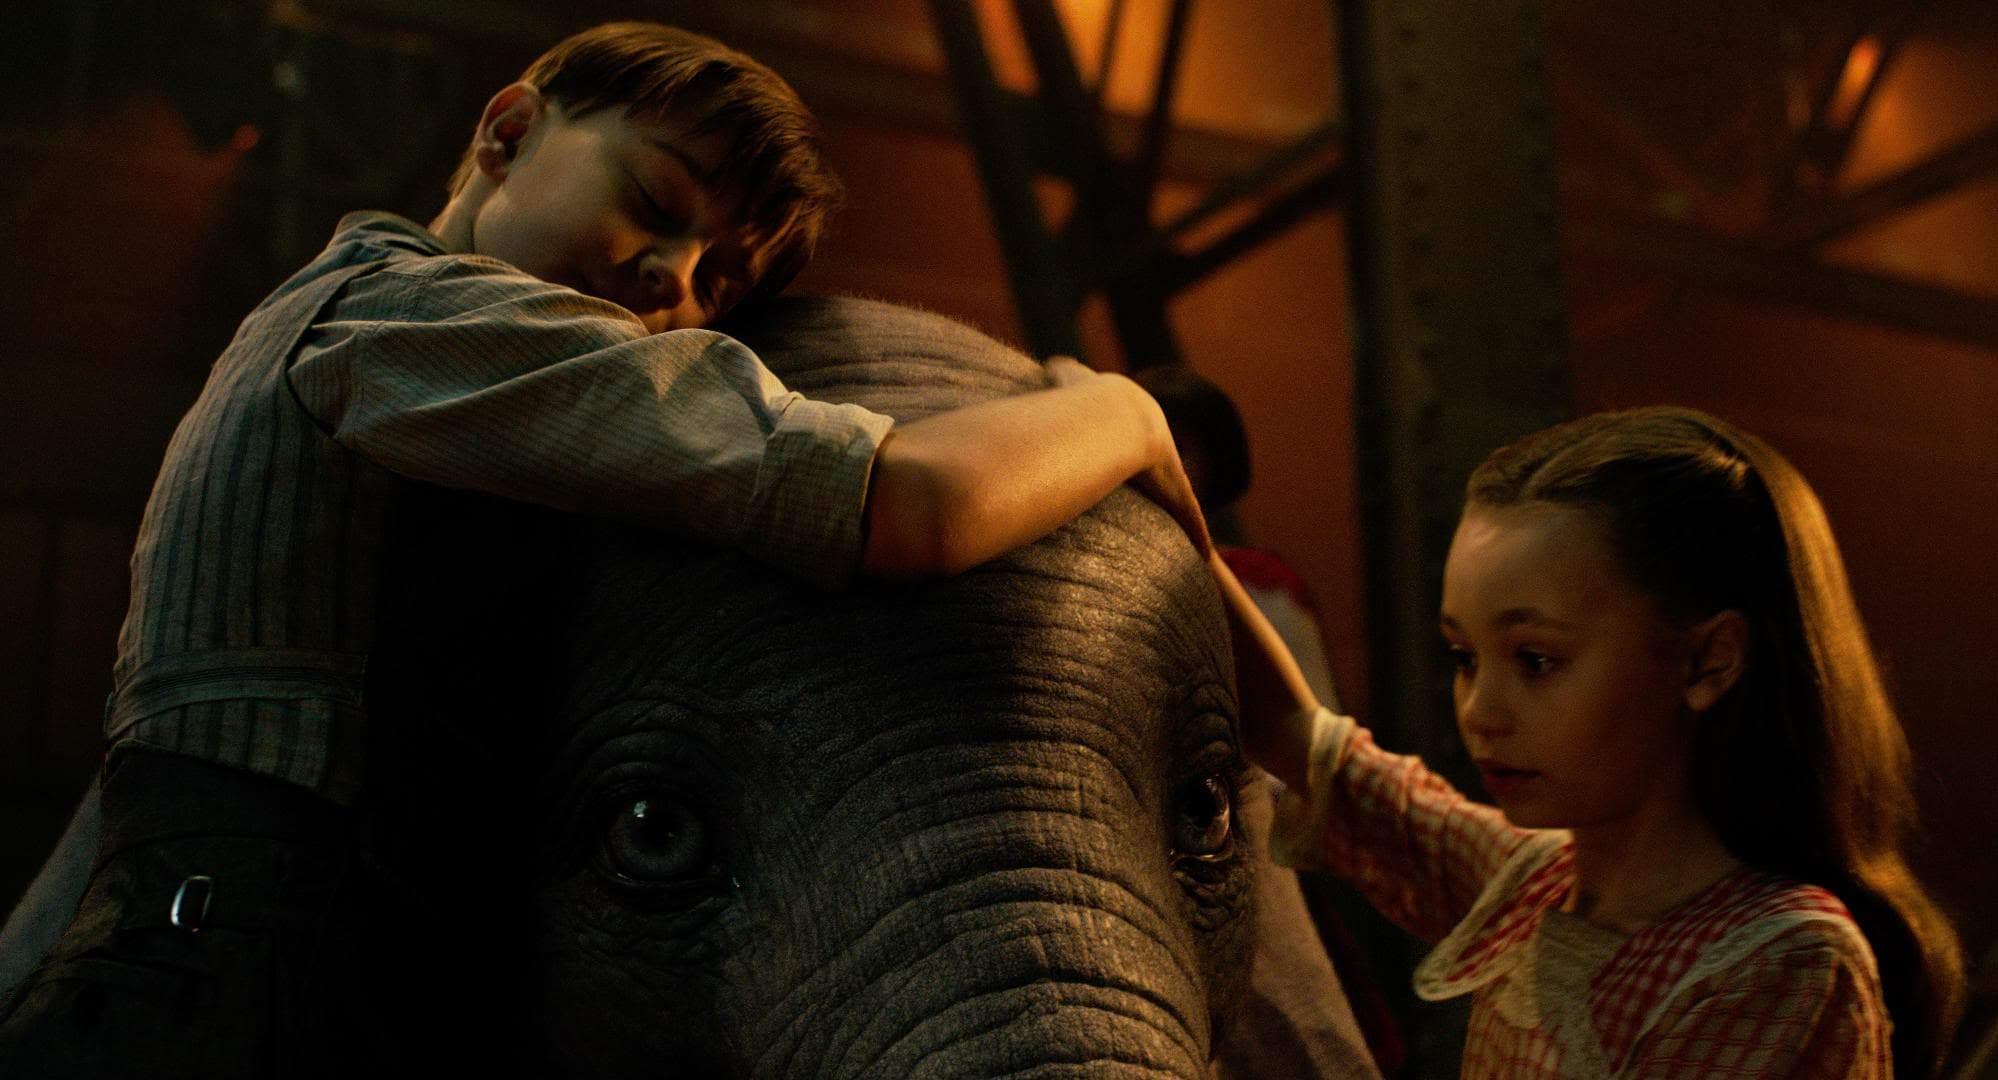 Box Office : 3月29日~31日の全米映画ボックスオフィスTOP5 - 「アリス」のティム・バートン監督が、空飛ぶ子象の名作アニメを実写化した「ダンボ」が、ディズニーの期待にそって、舞い上がることが出来ず、低空飛行に甘んじたガッカリの初登場第1位 ! !